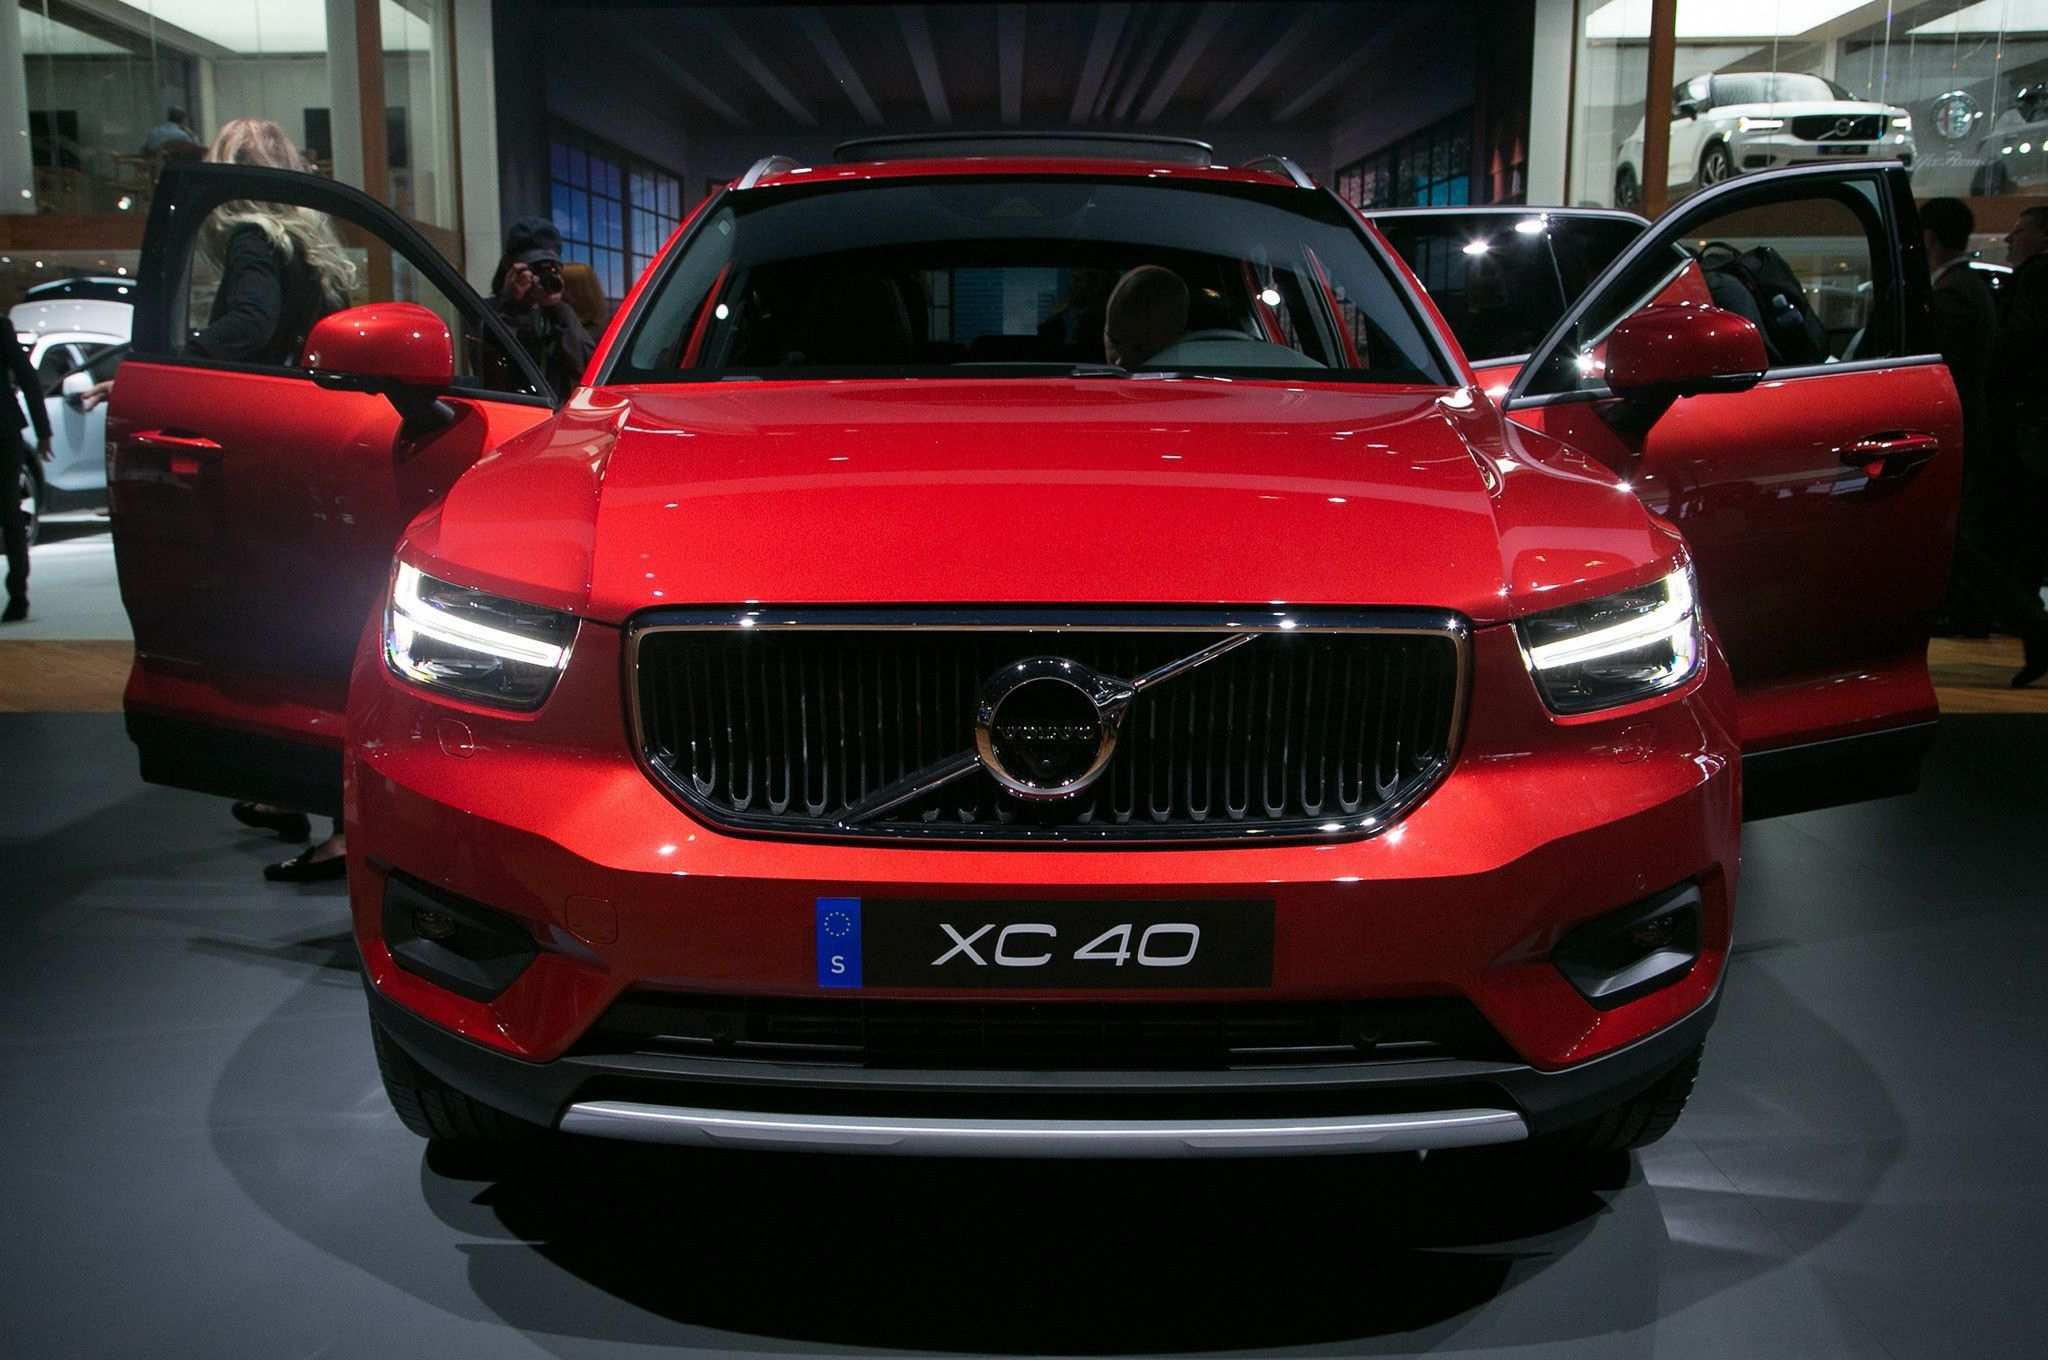 47 Gallery of Volvo 2020 Xc40 Exterior Rumors by Volvo 2020 Xc40 Exterior